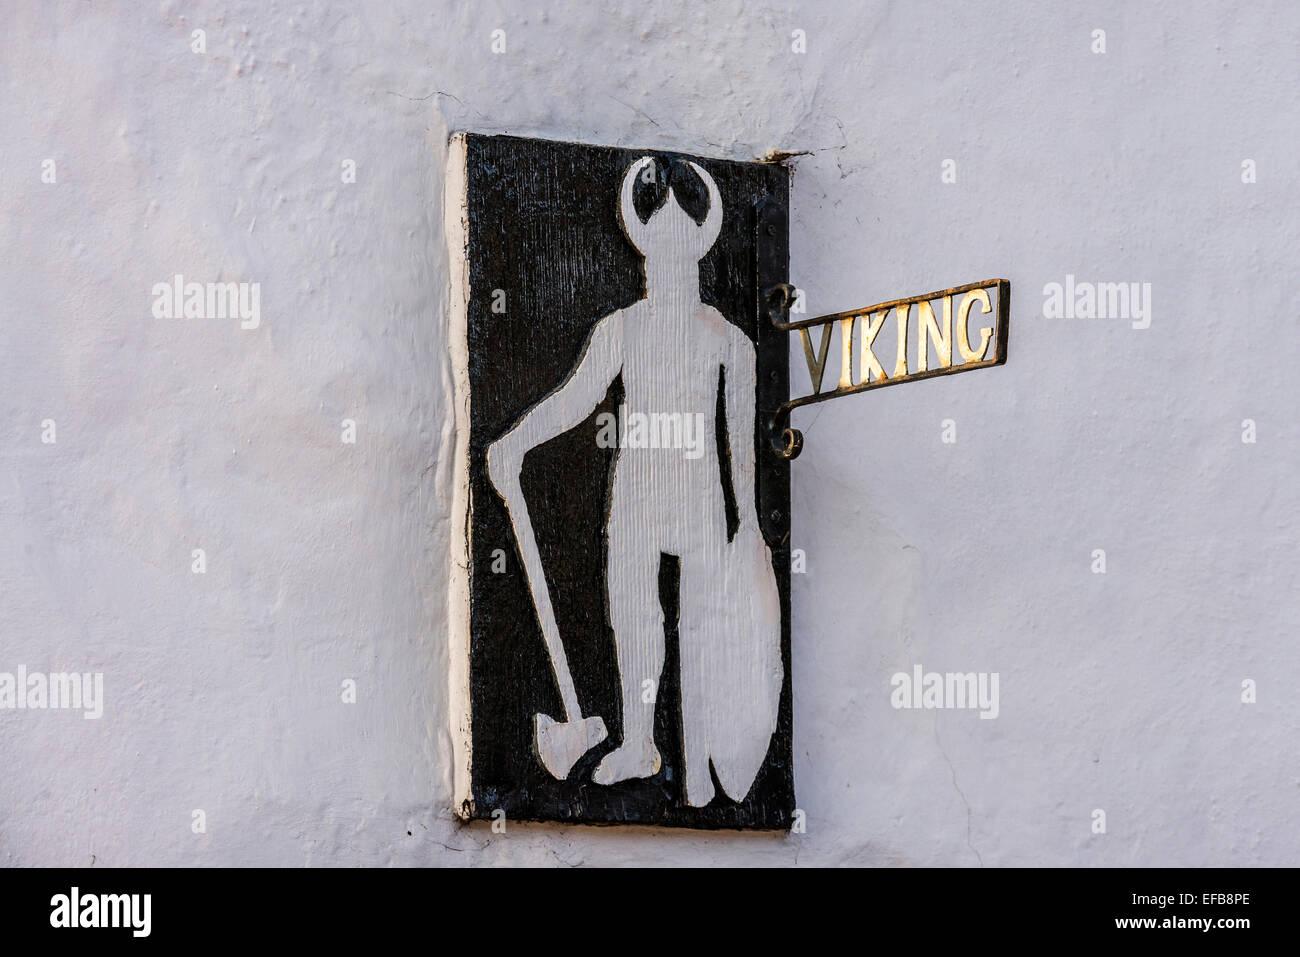 Viking house sign. Viking cottage. Lindfield. West Sussex. UK - Stock Image